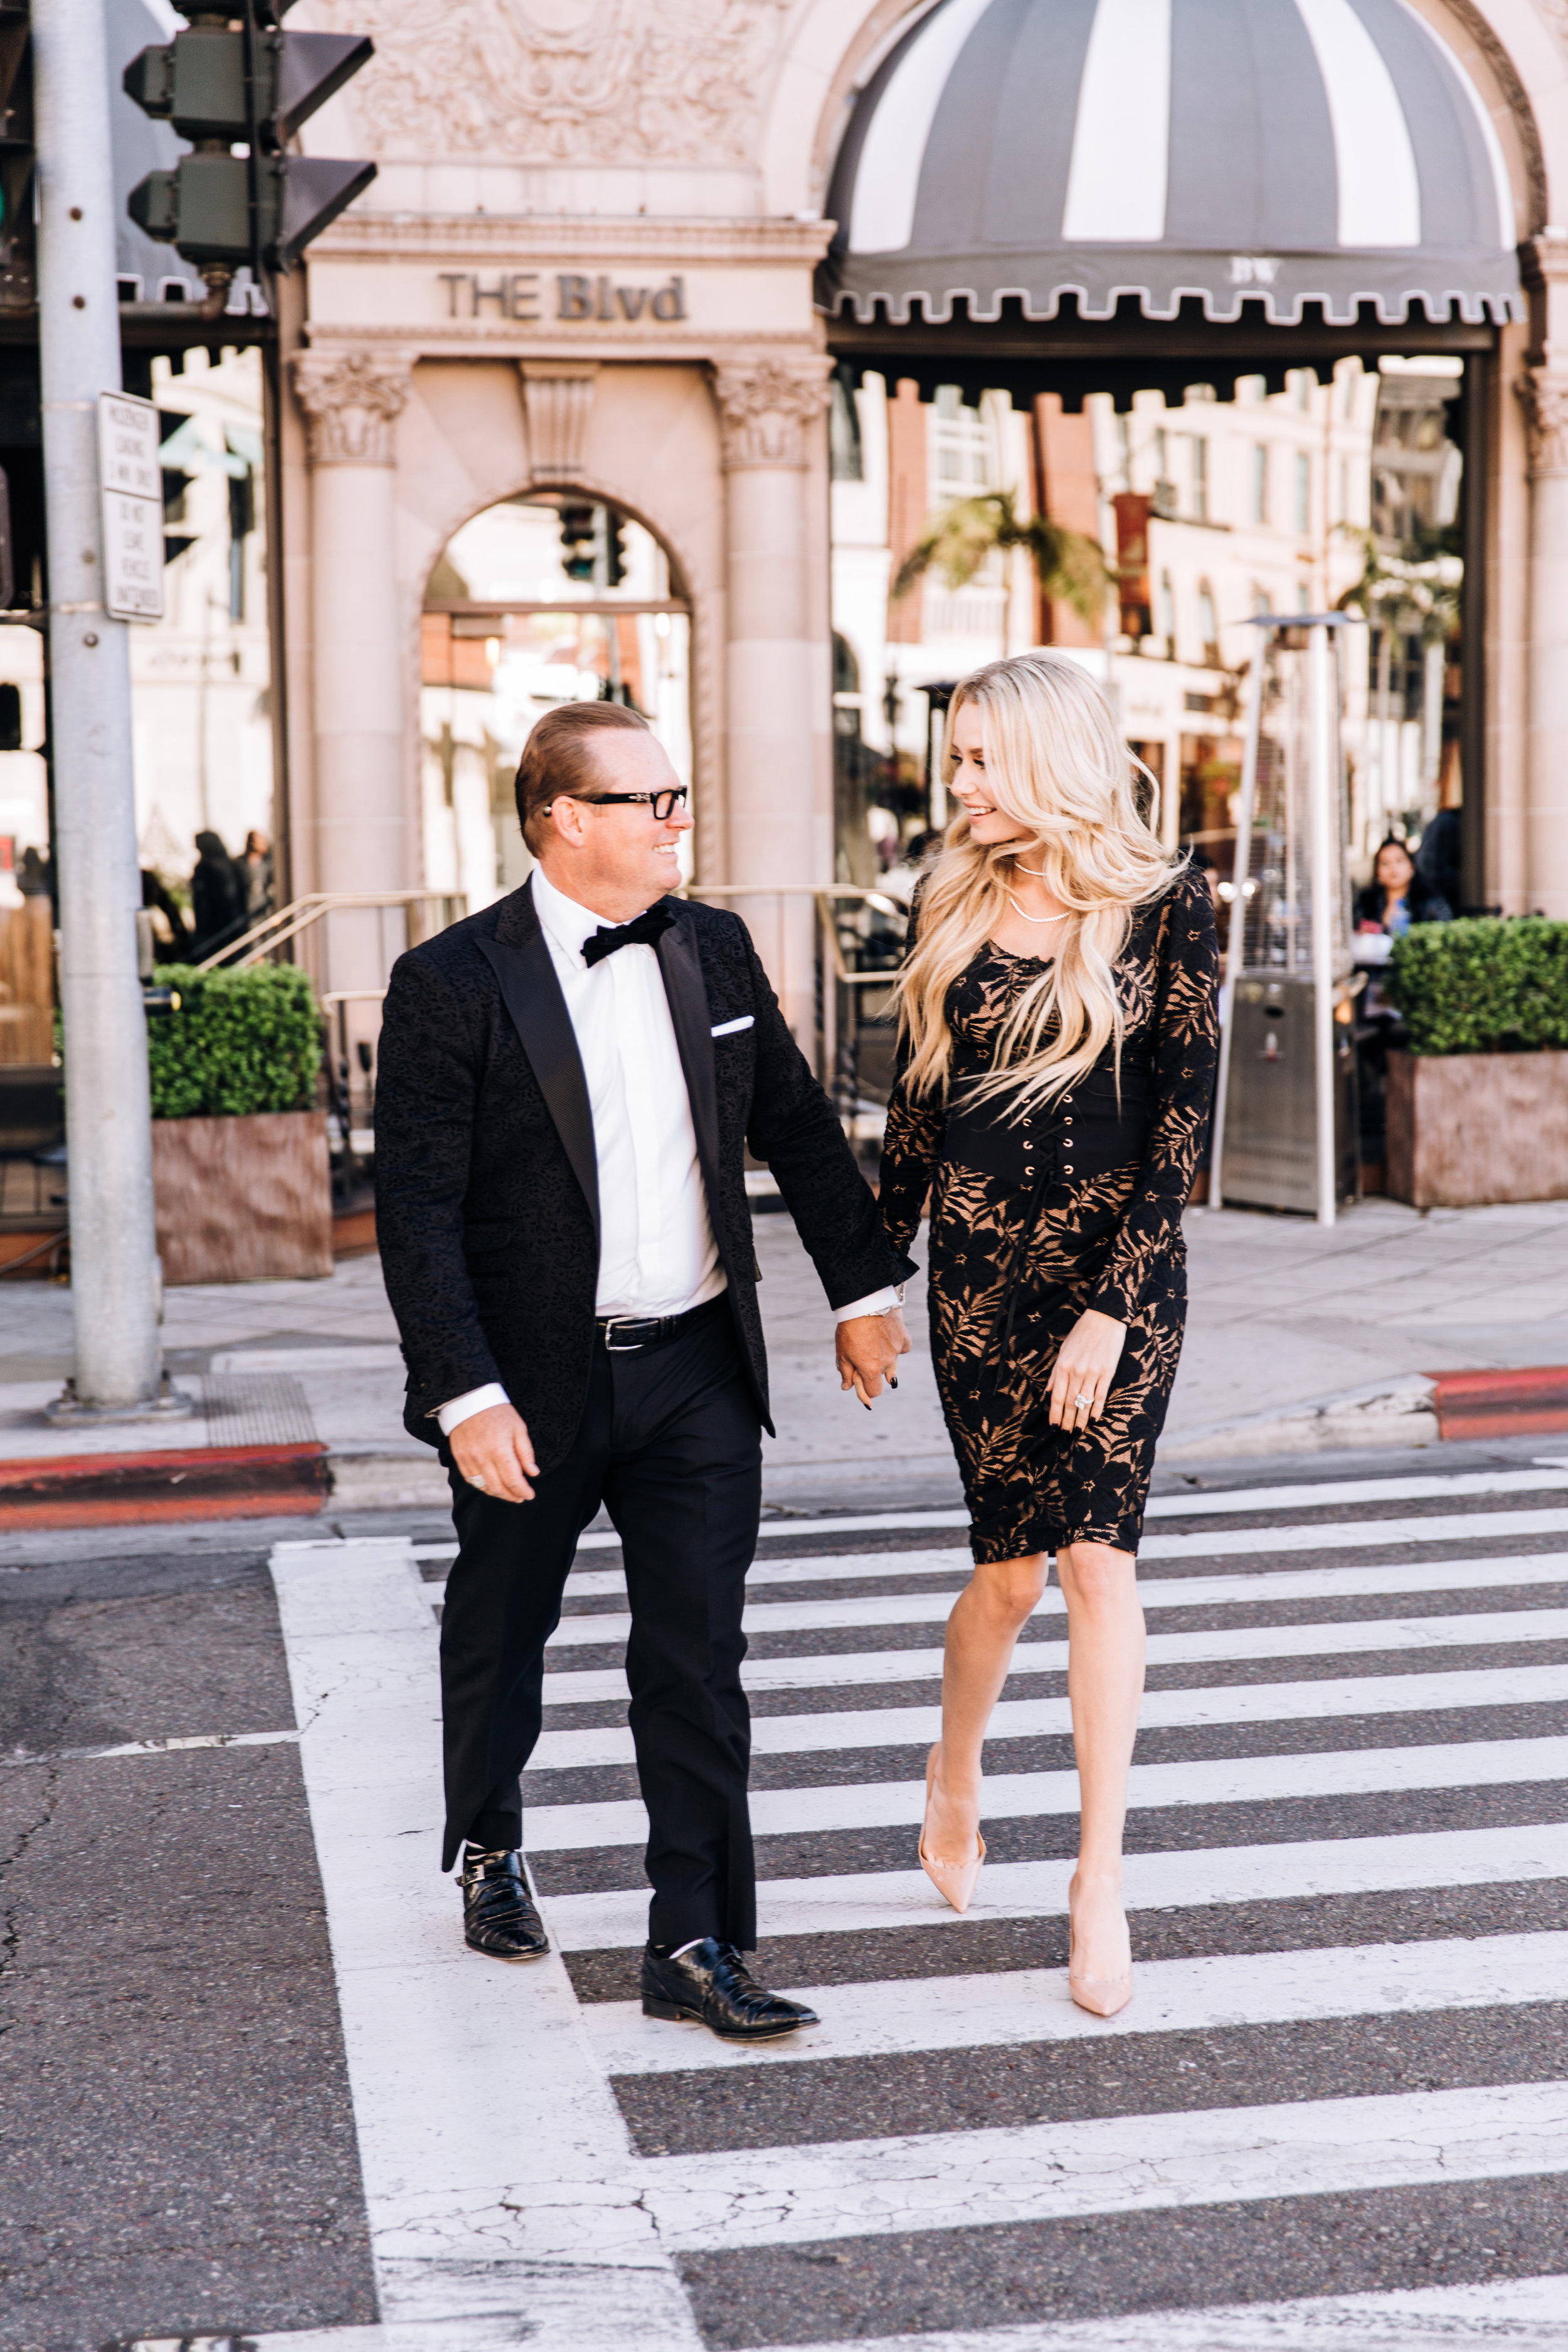 KaraNixonWeddings-BeverlyHills-RodeoDr-Engagement-15.jpg